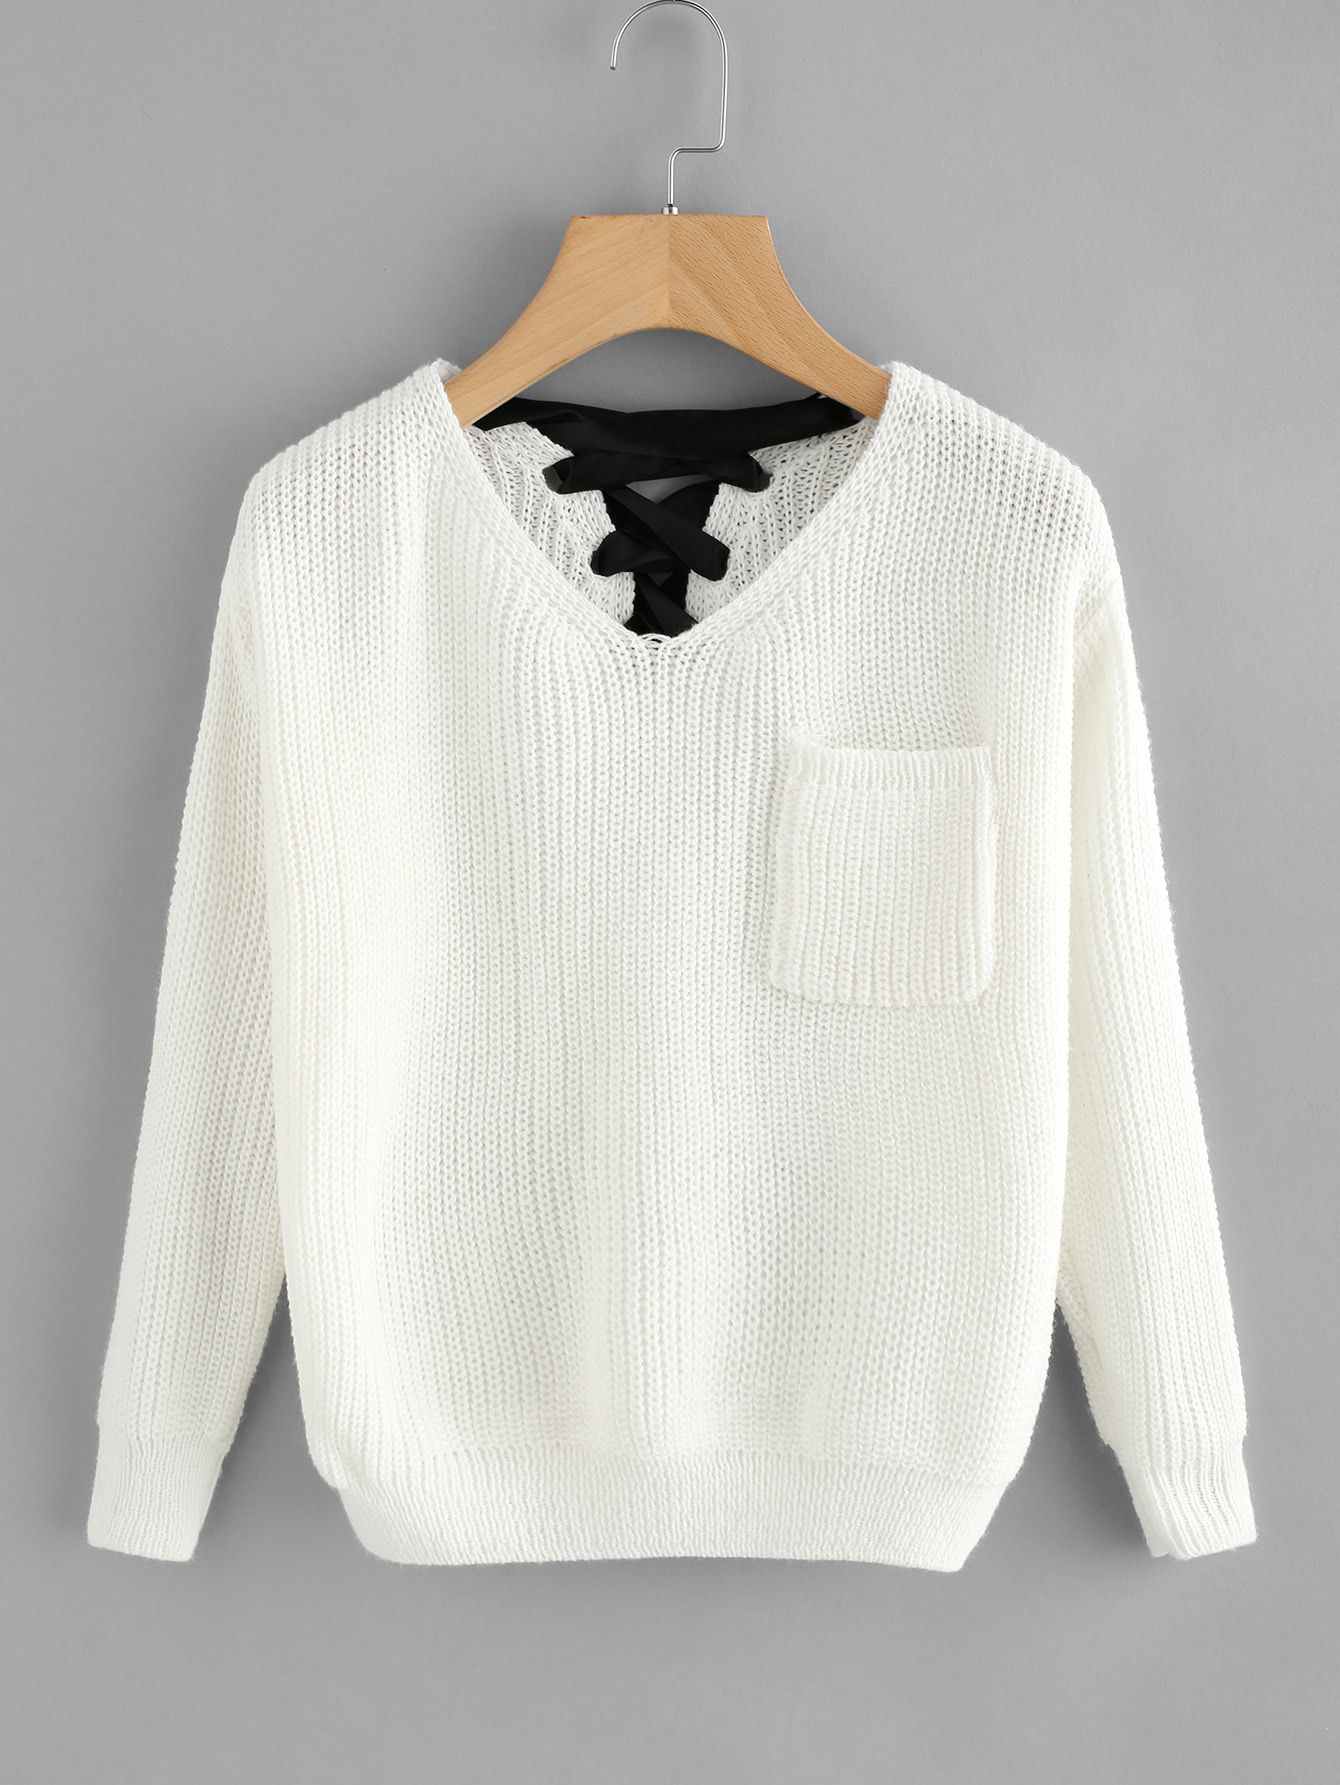 3d36b0c098 Shop V Neckline Lace Up Back Texture Knit Sweater online. SheIn offers V  Neckline Lace Up Back Texture Knit Sweater   more to fit your fashionable  needs.